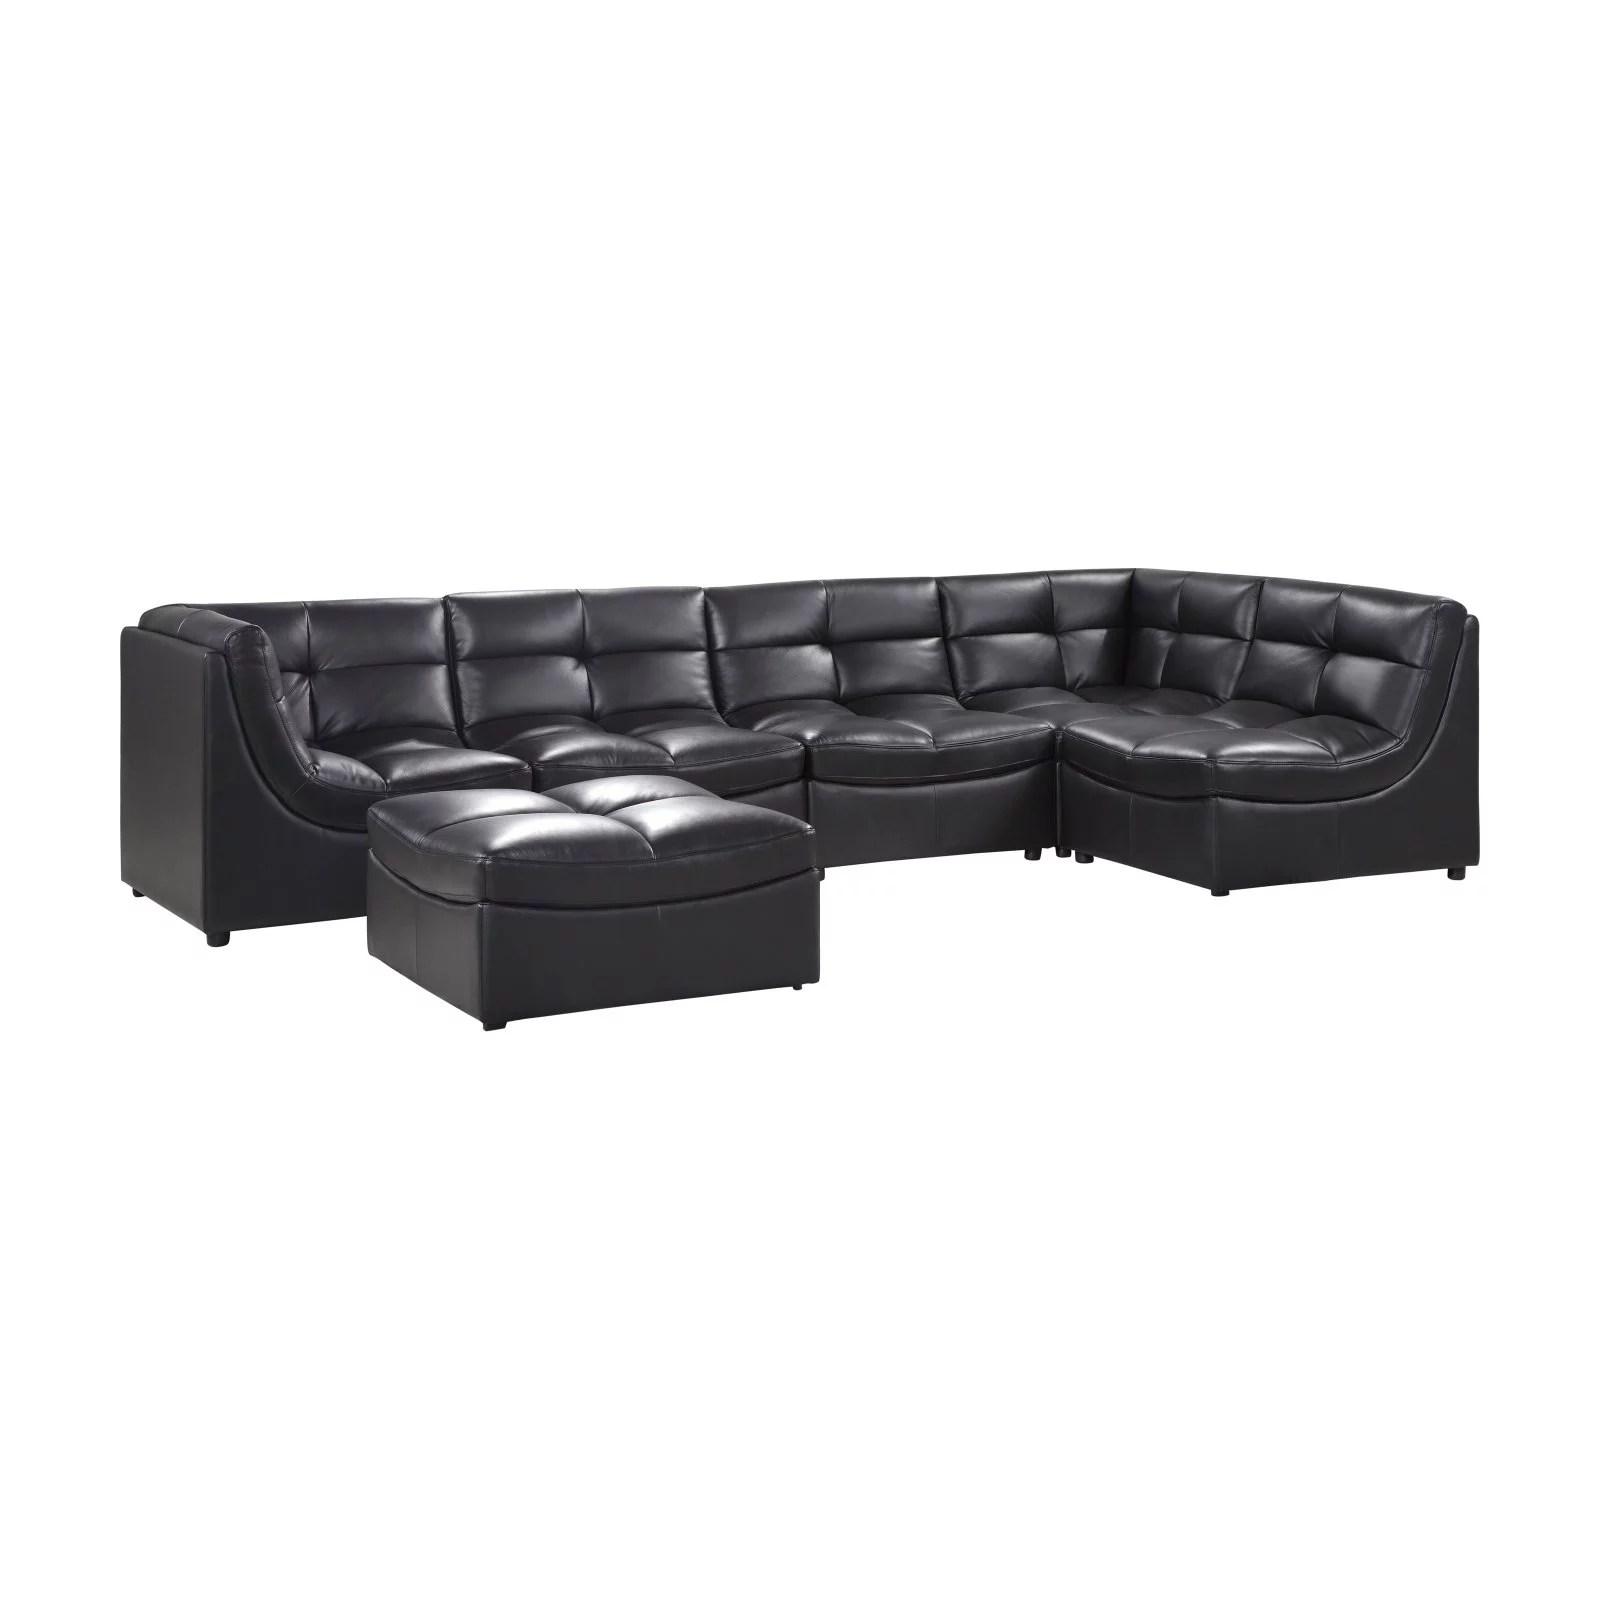 6 piece modular sectional sofa lazy boy reese best master furniture cloud walmart com